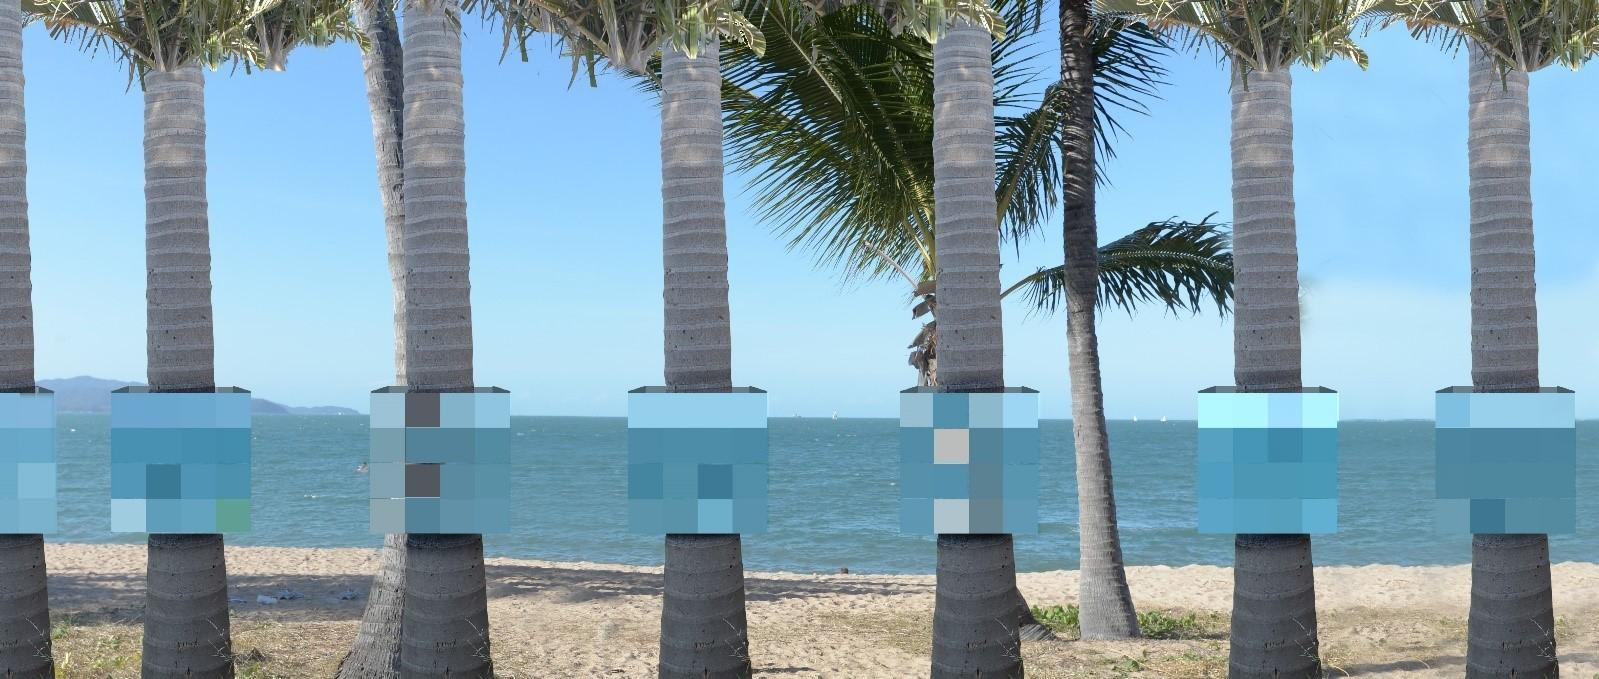 I wish you were here - Carla Gottgens- Digitally printed self-adhesive vinyl, acrylic sheet, steel